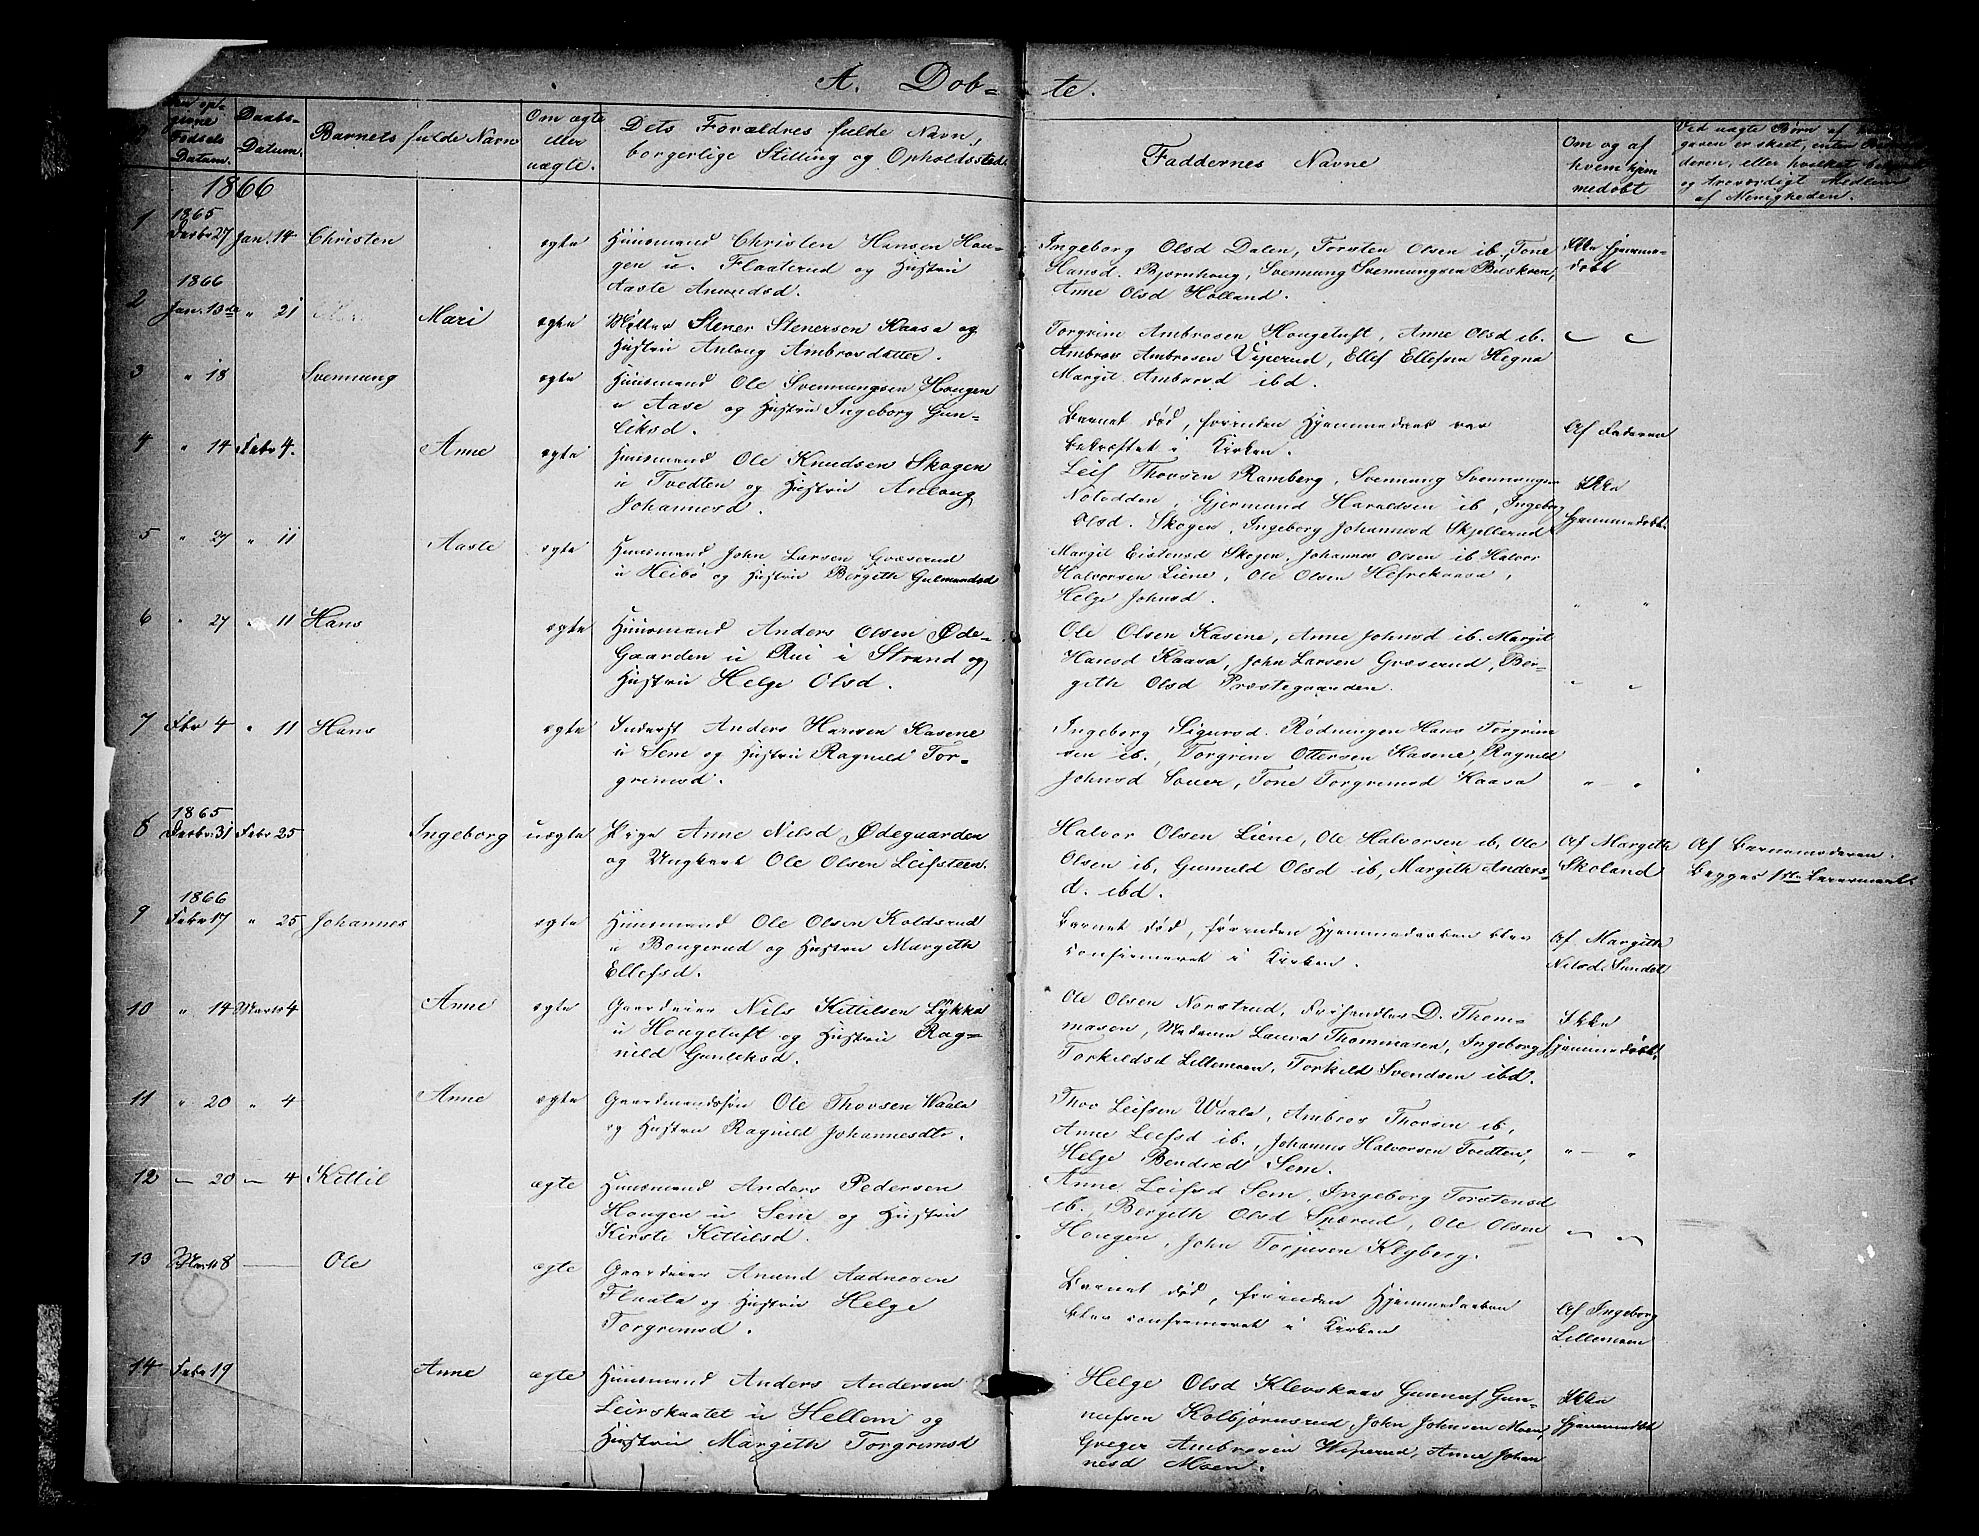 SAKO, Heddal kirkebøker, G/Ga/L0001: Klokkerbok nr. I 1, 1866-1878, s. 2-3